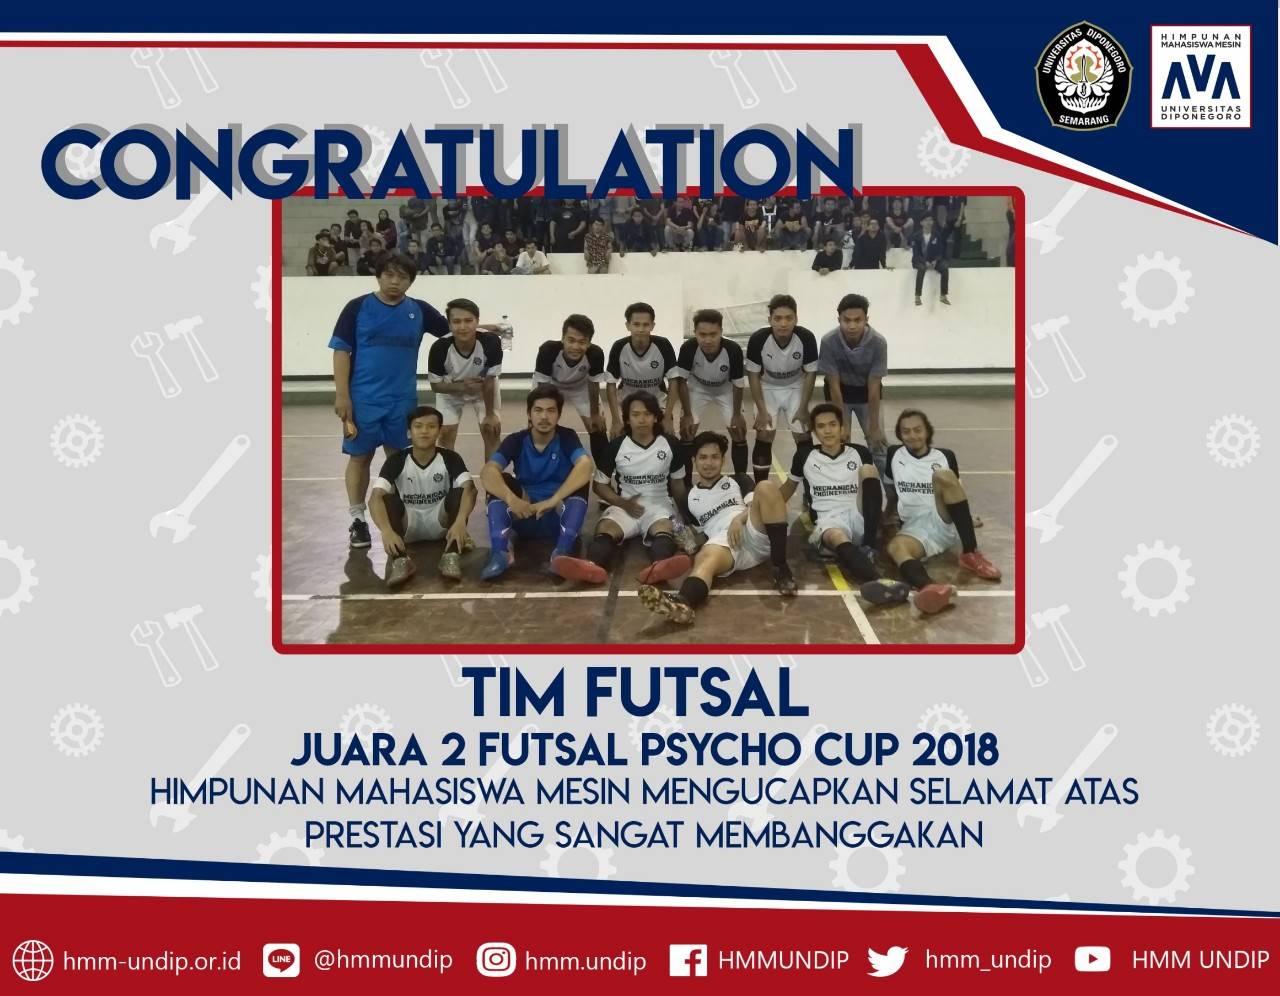 Tim Futsal-Badminton-Volly HMM Juara 2 dalam Pychco Cup 2018 dan Cancas 2018